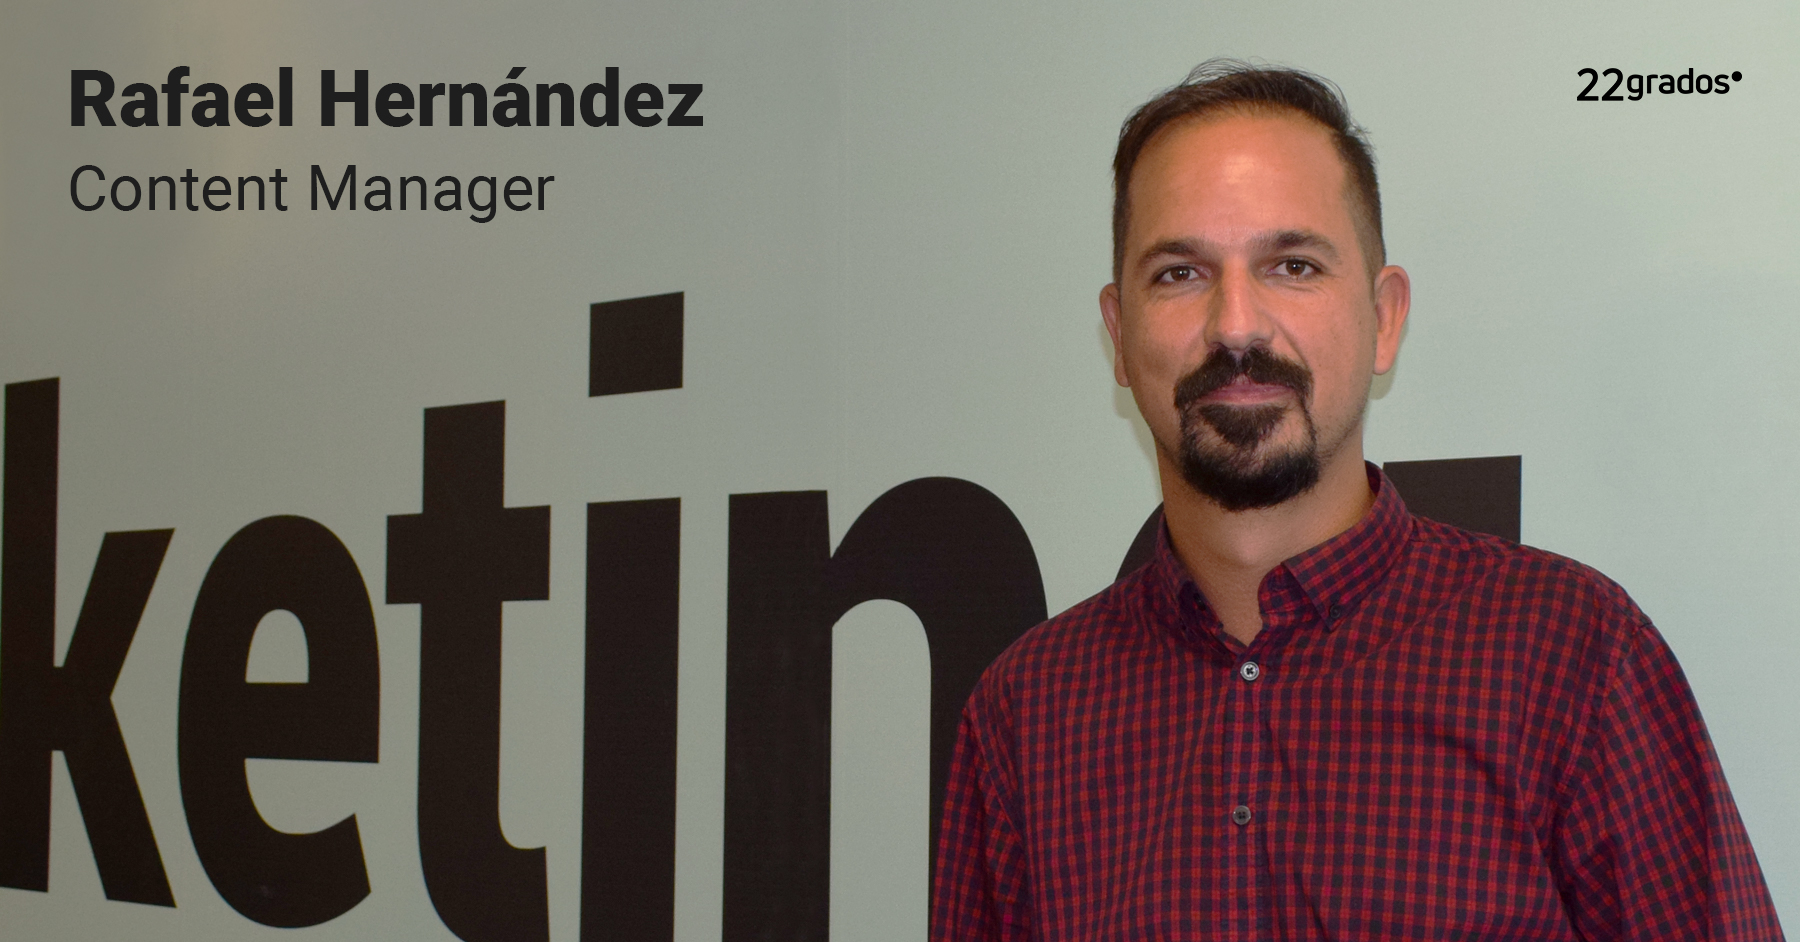 Rafael Hernández se incorpora como Content Manager